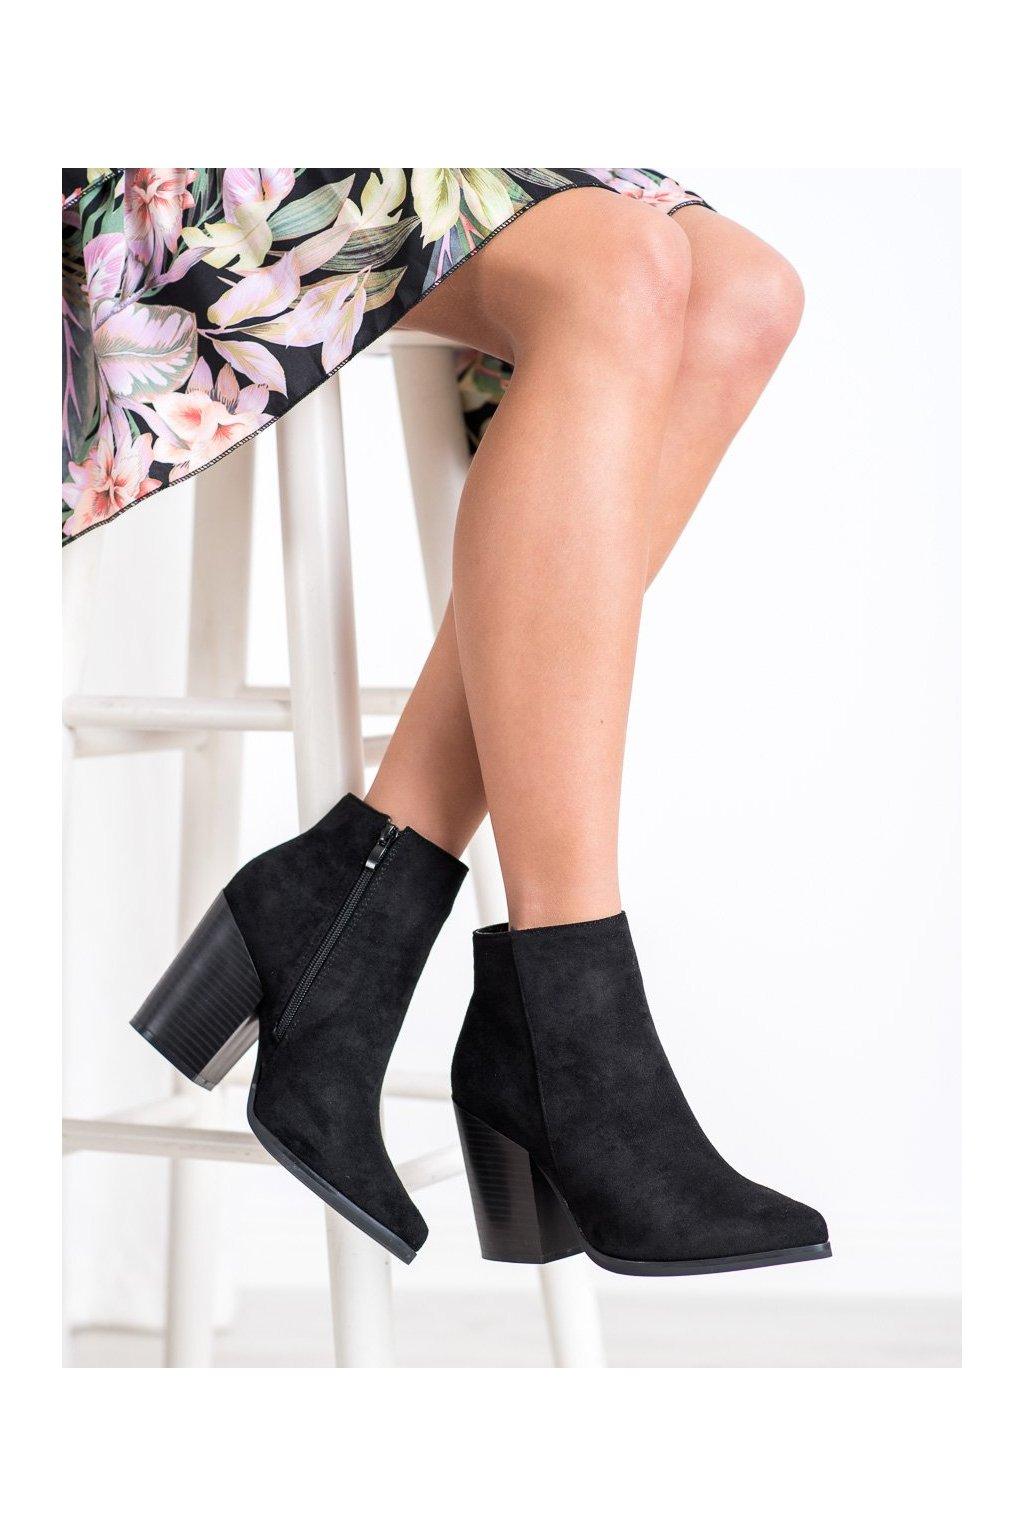 Čierne dámske topánky Super me kod 8007-GA-B